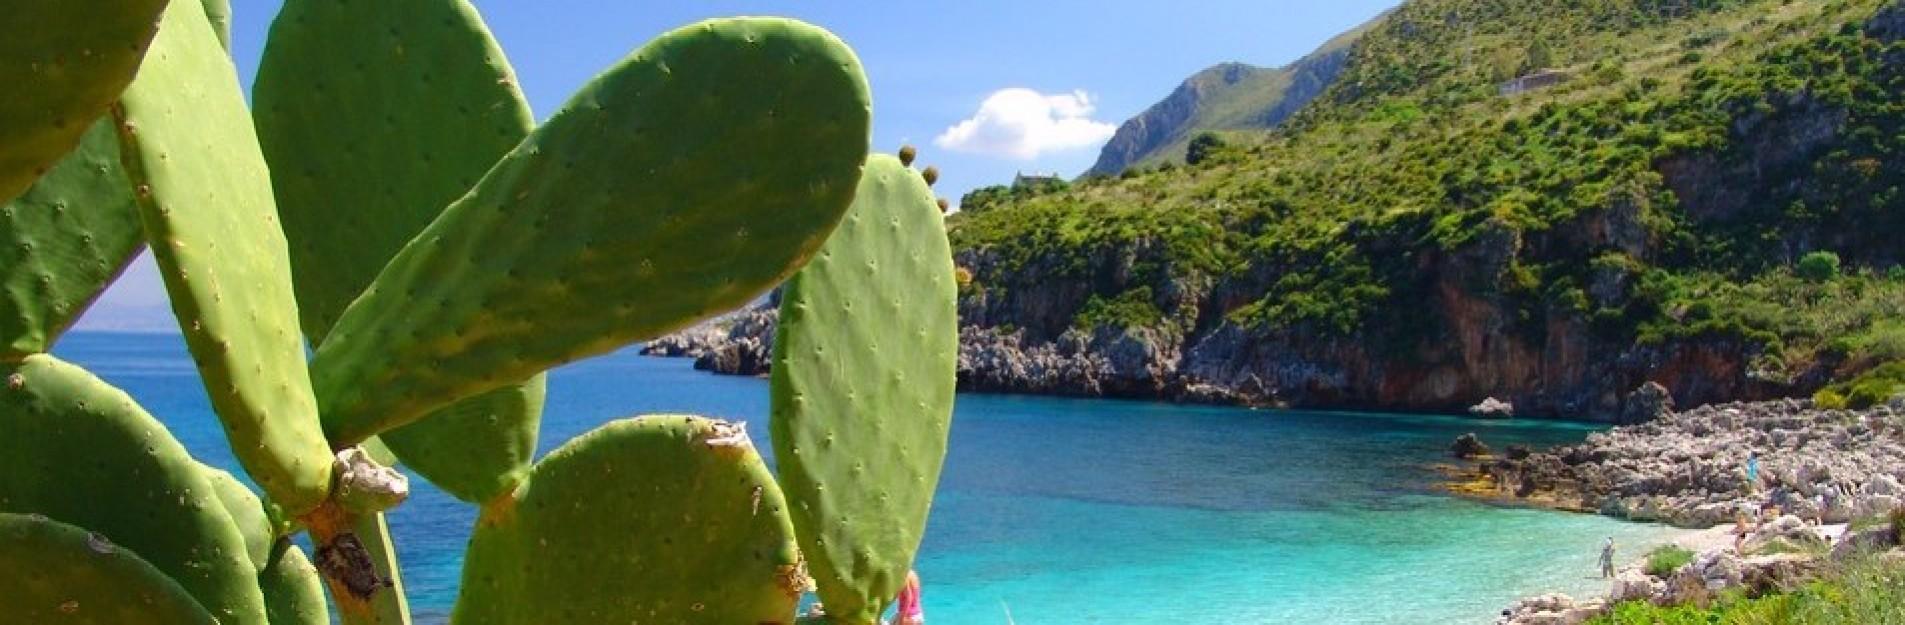 Enjoy Sicily ....book now!